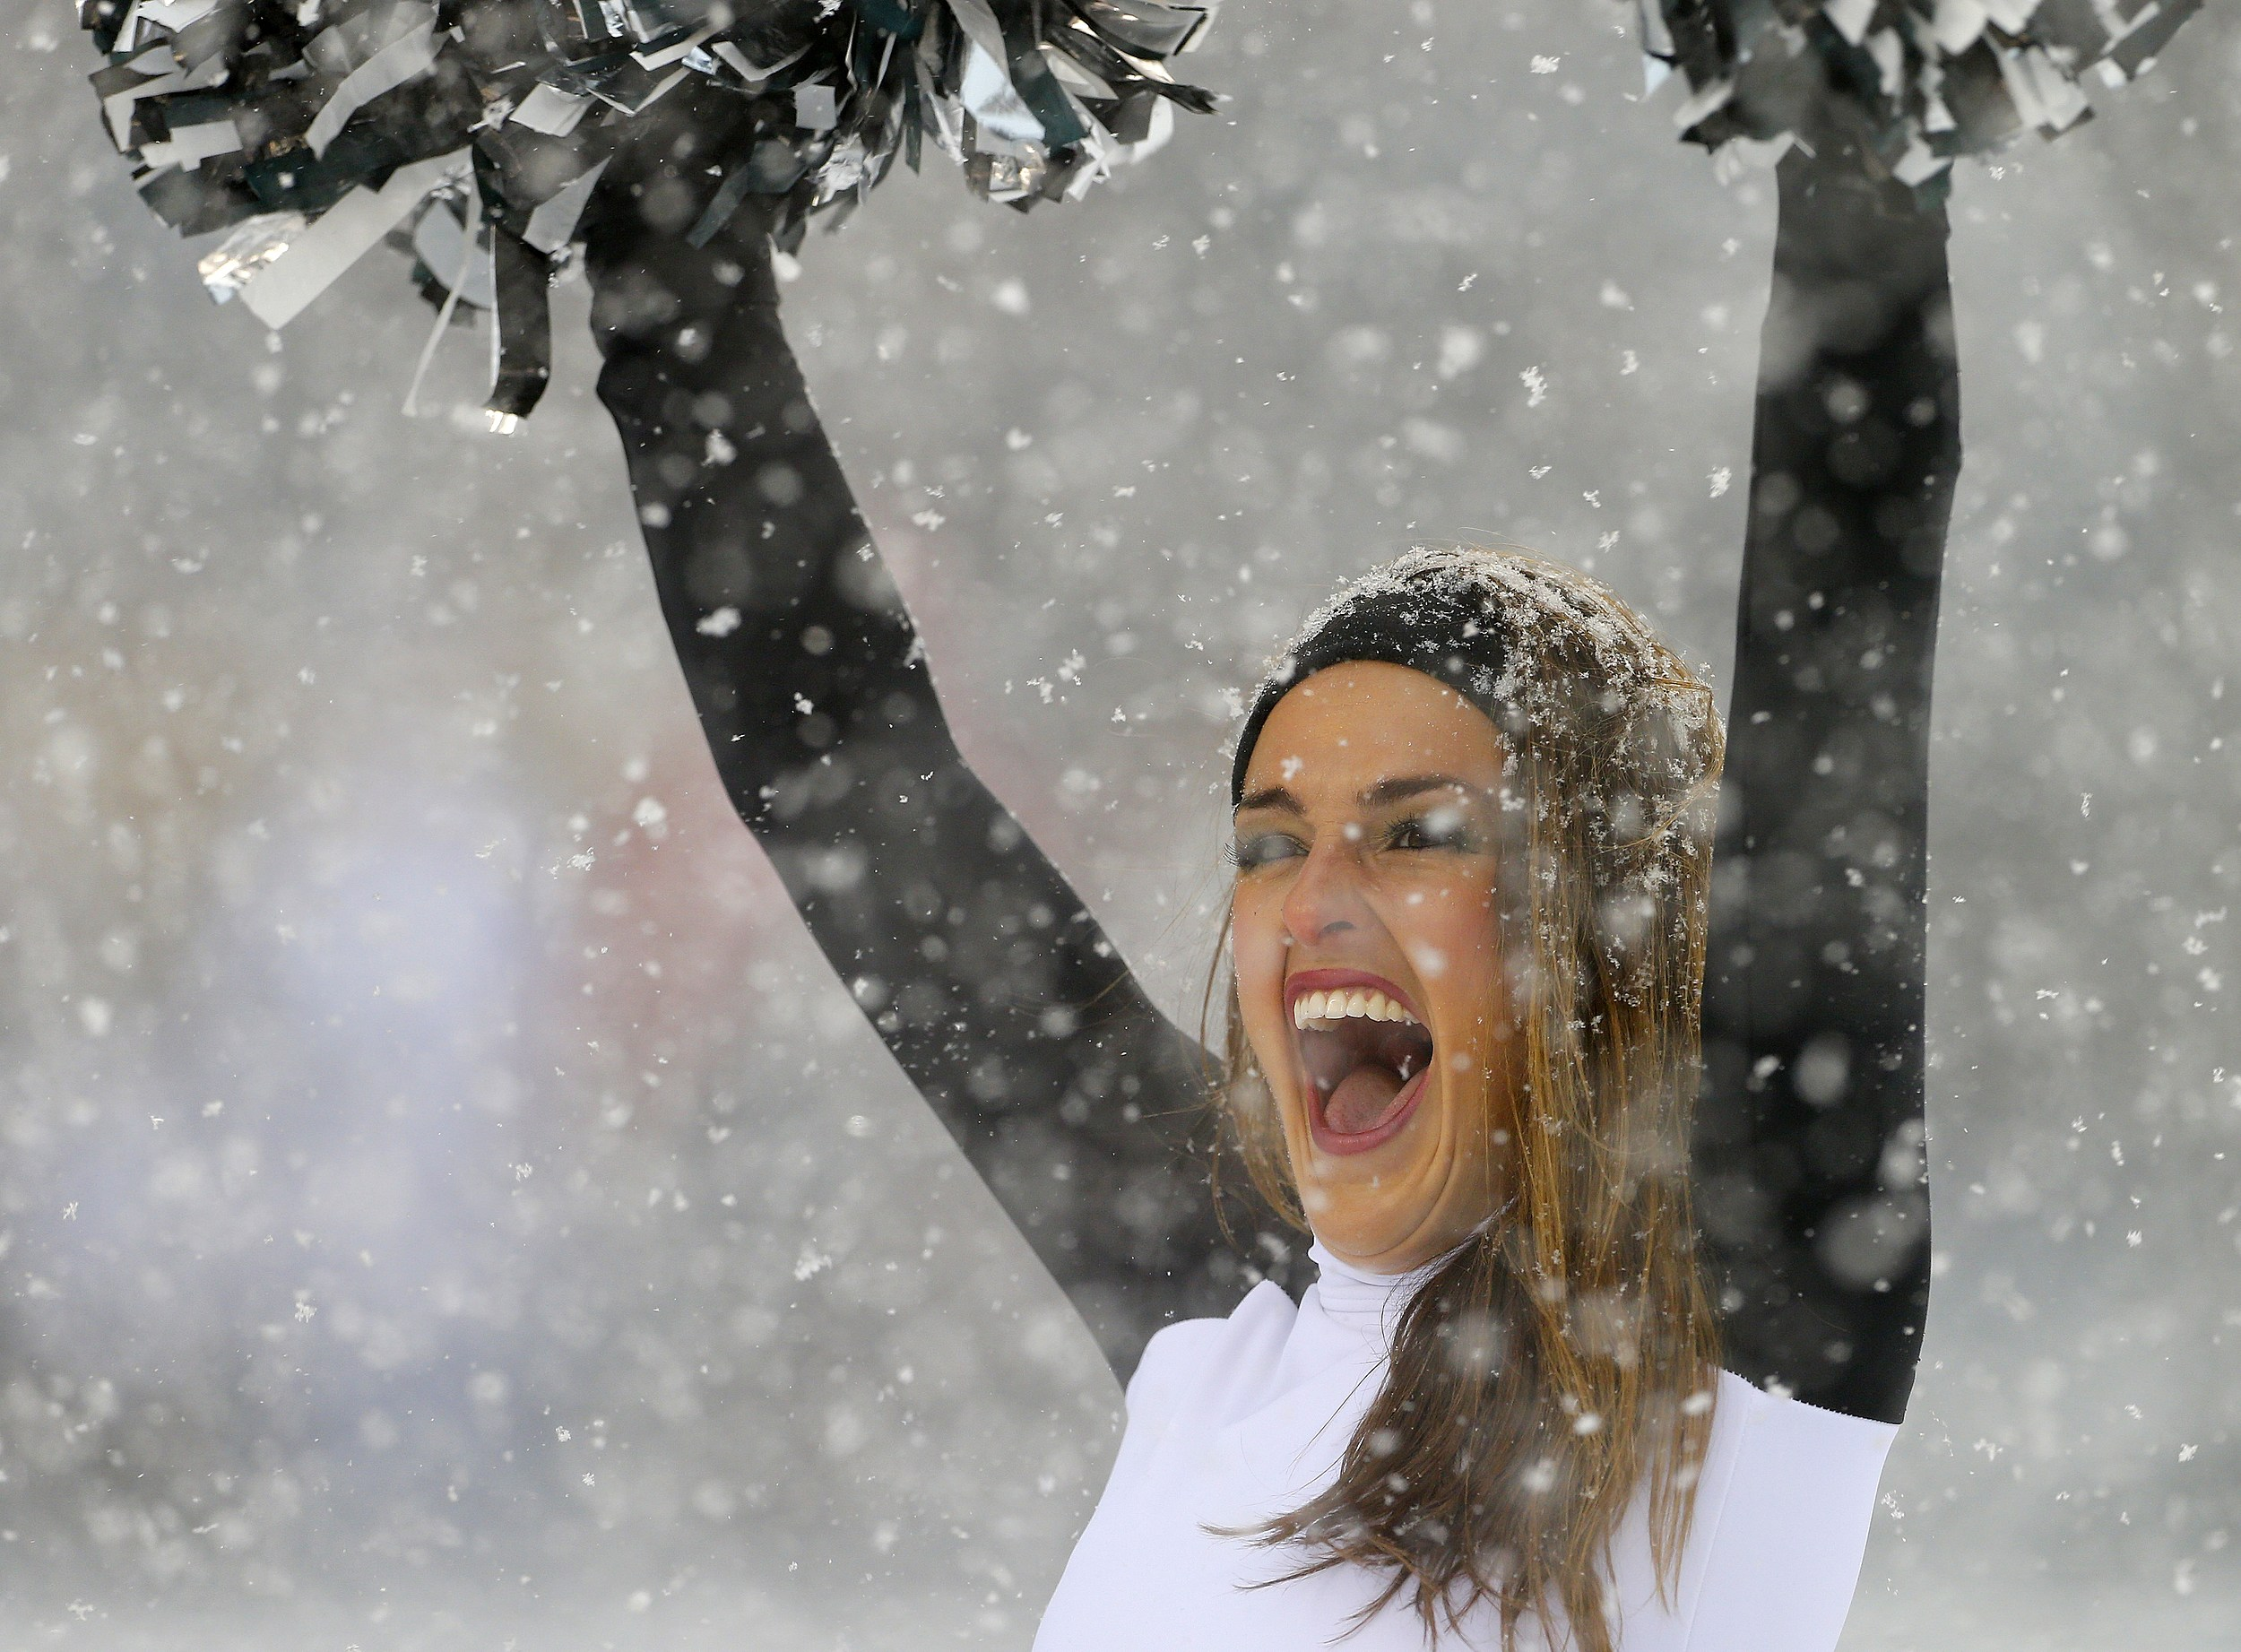 Jeweler loses 151,000 dollars on snow bet